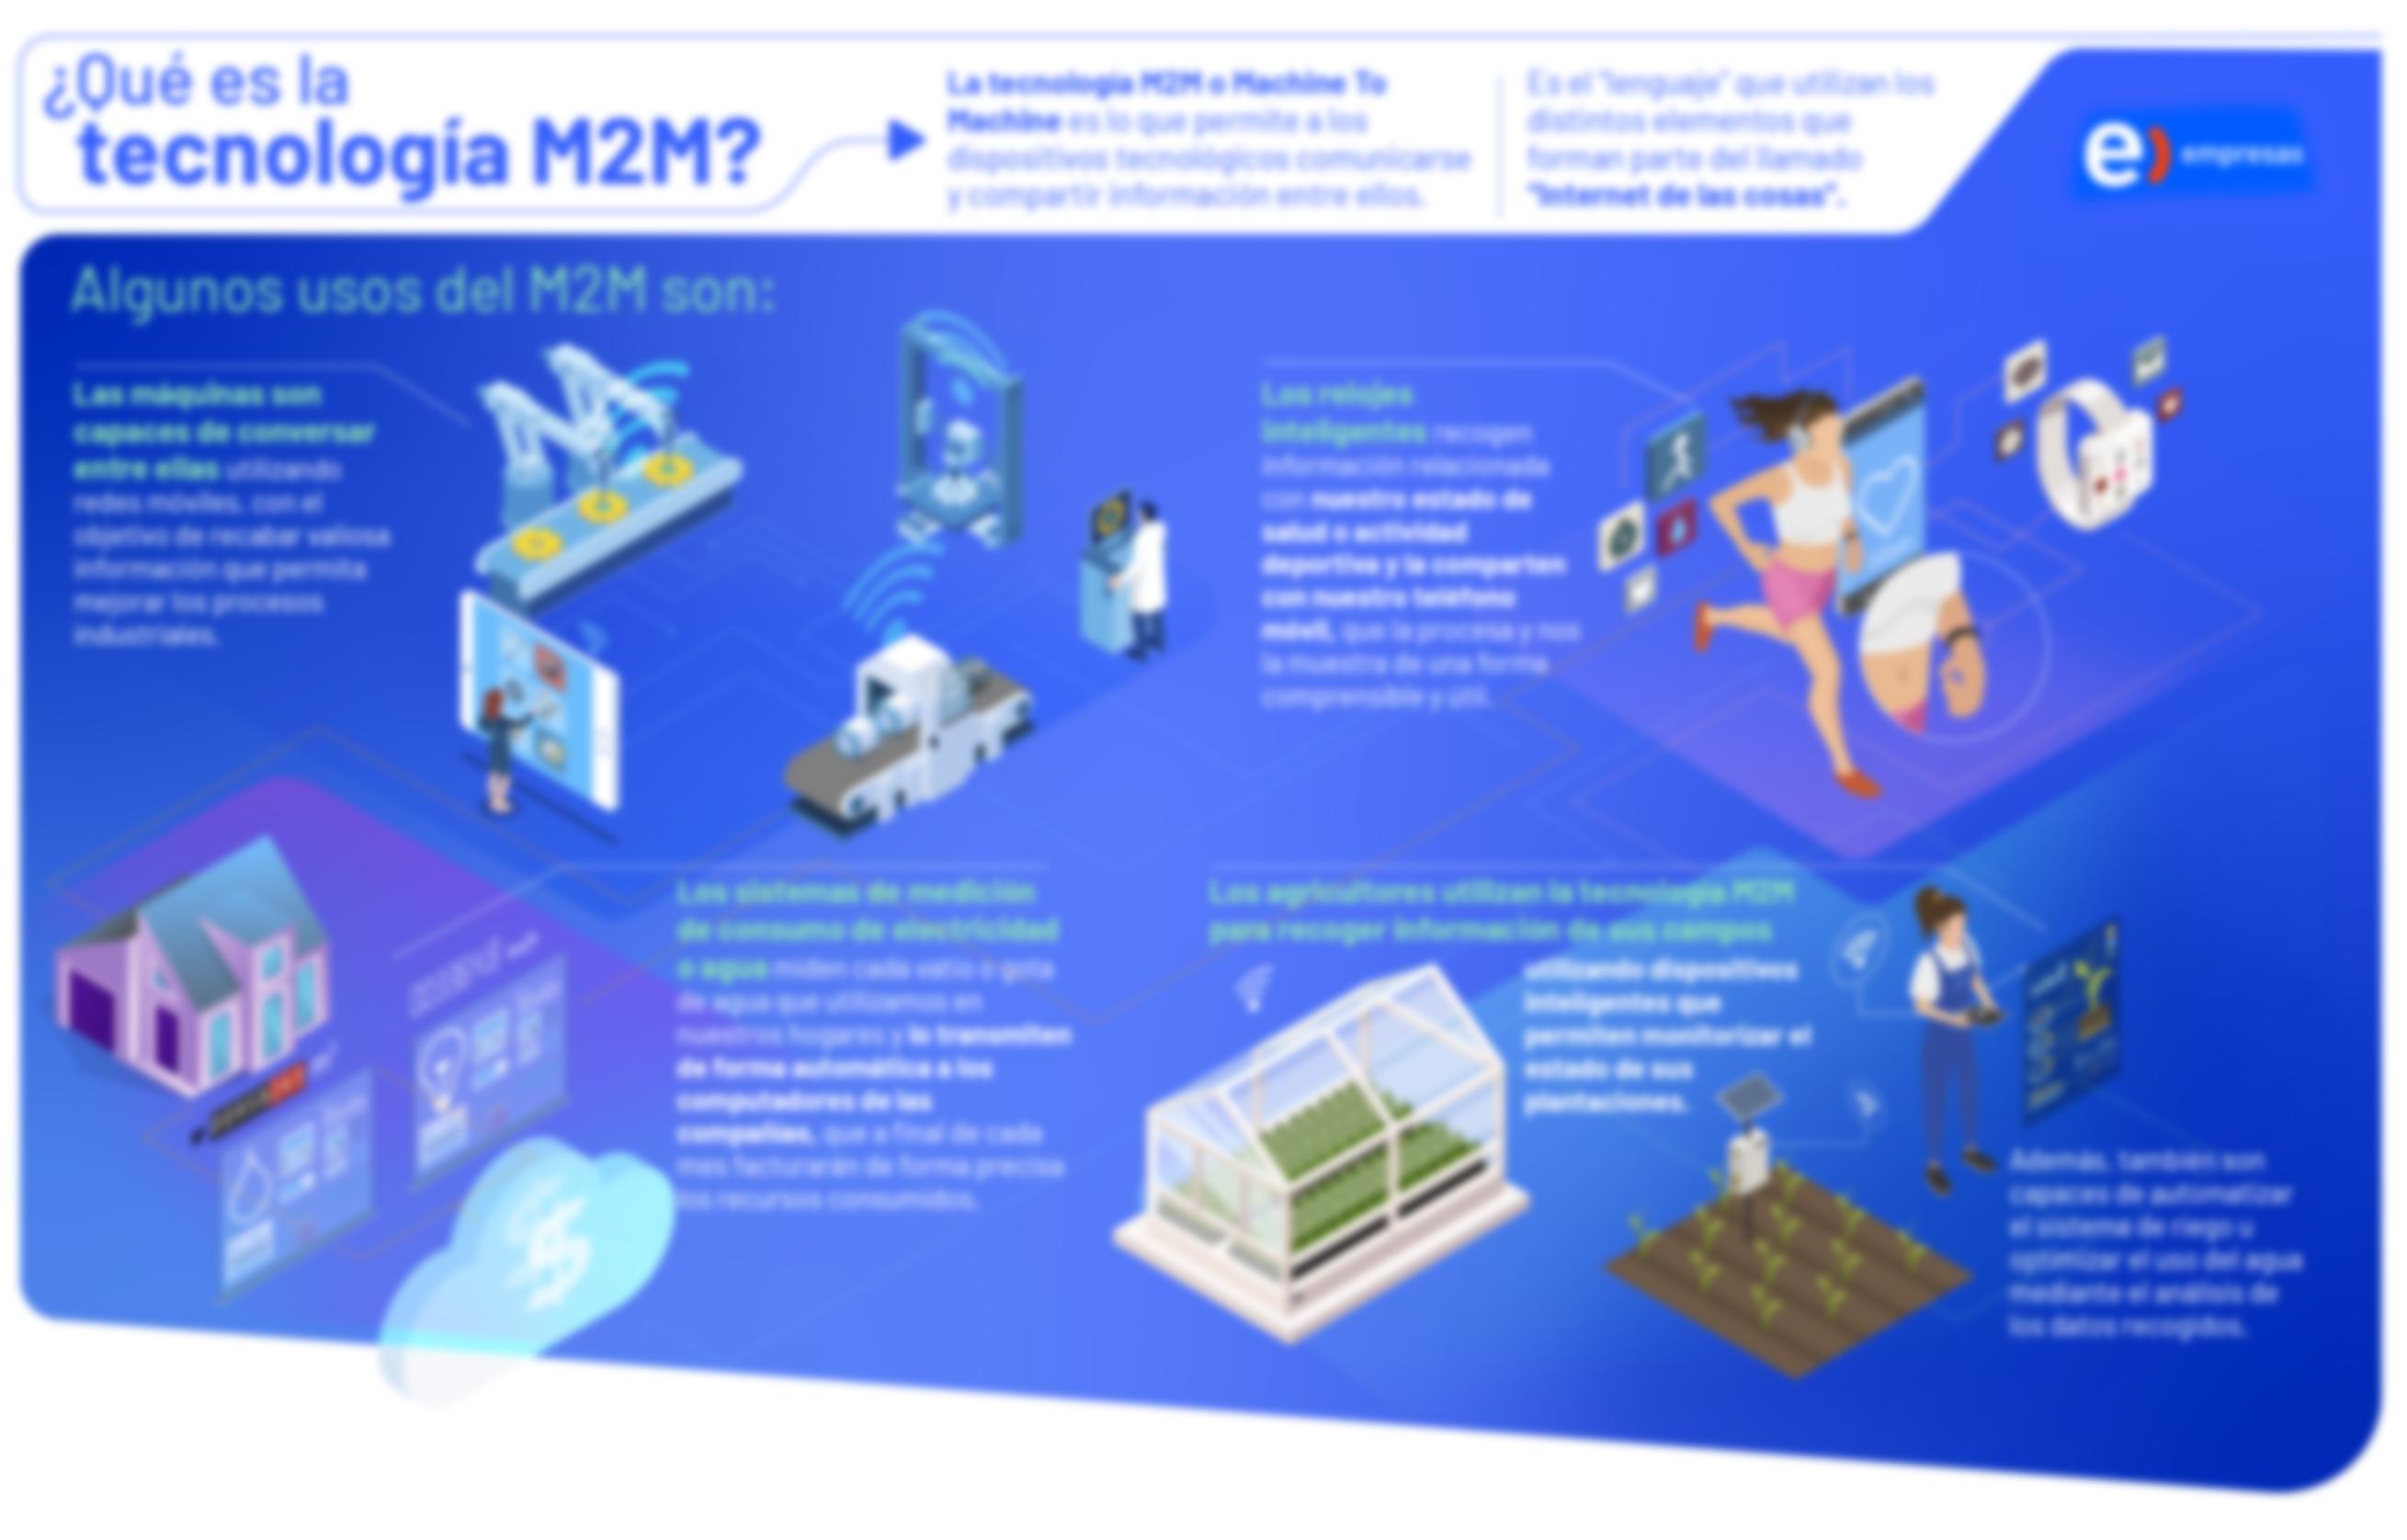 M2M desenfocada-2